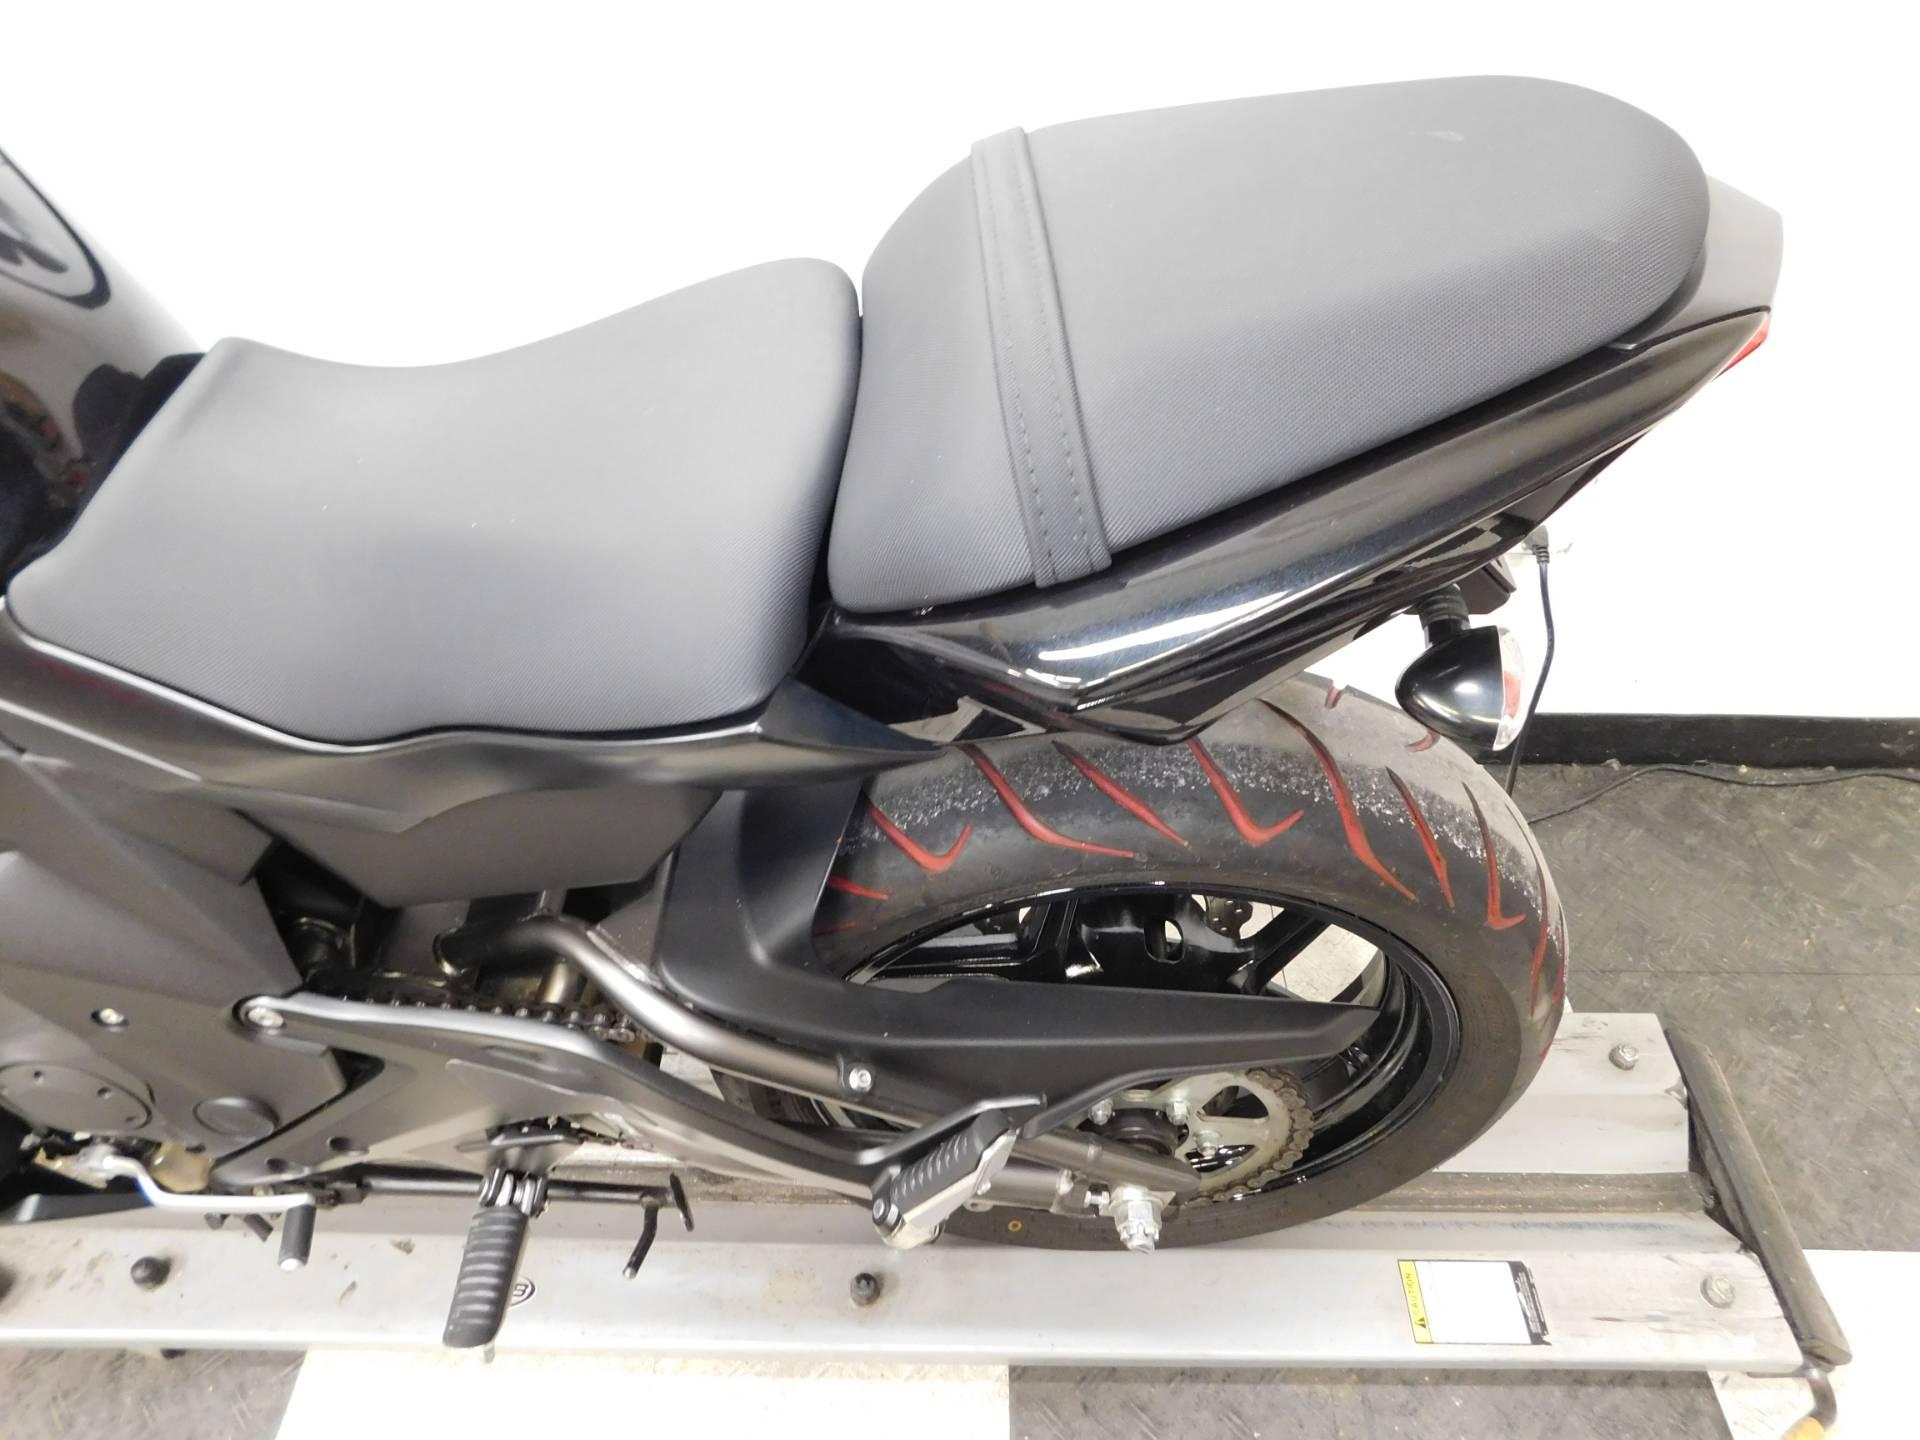 2012 Kawasaki Ninja 650 9